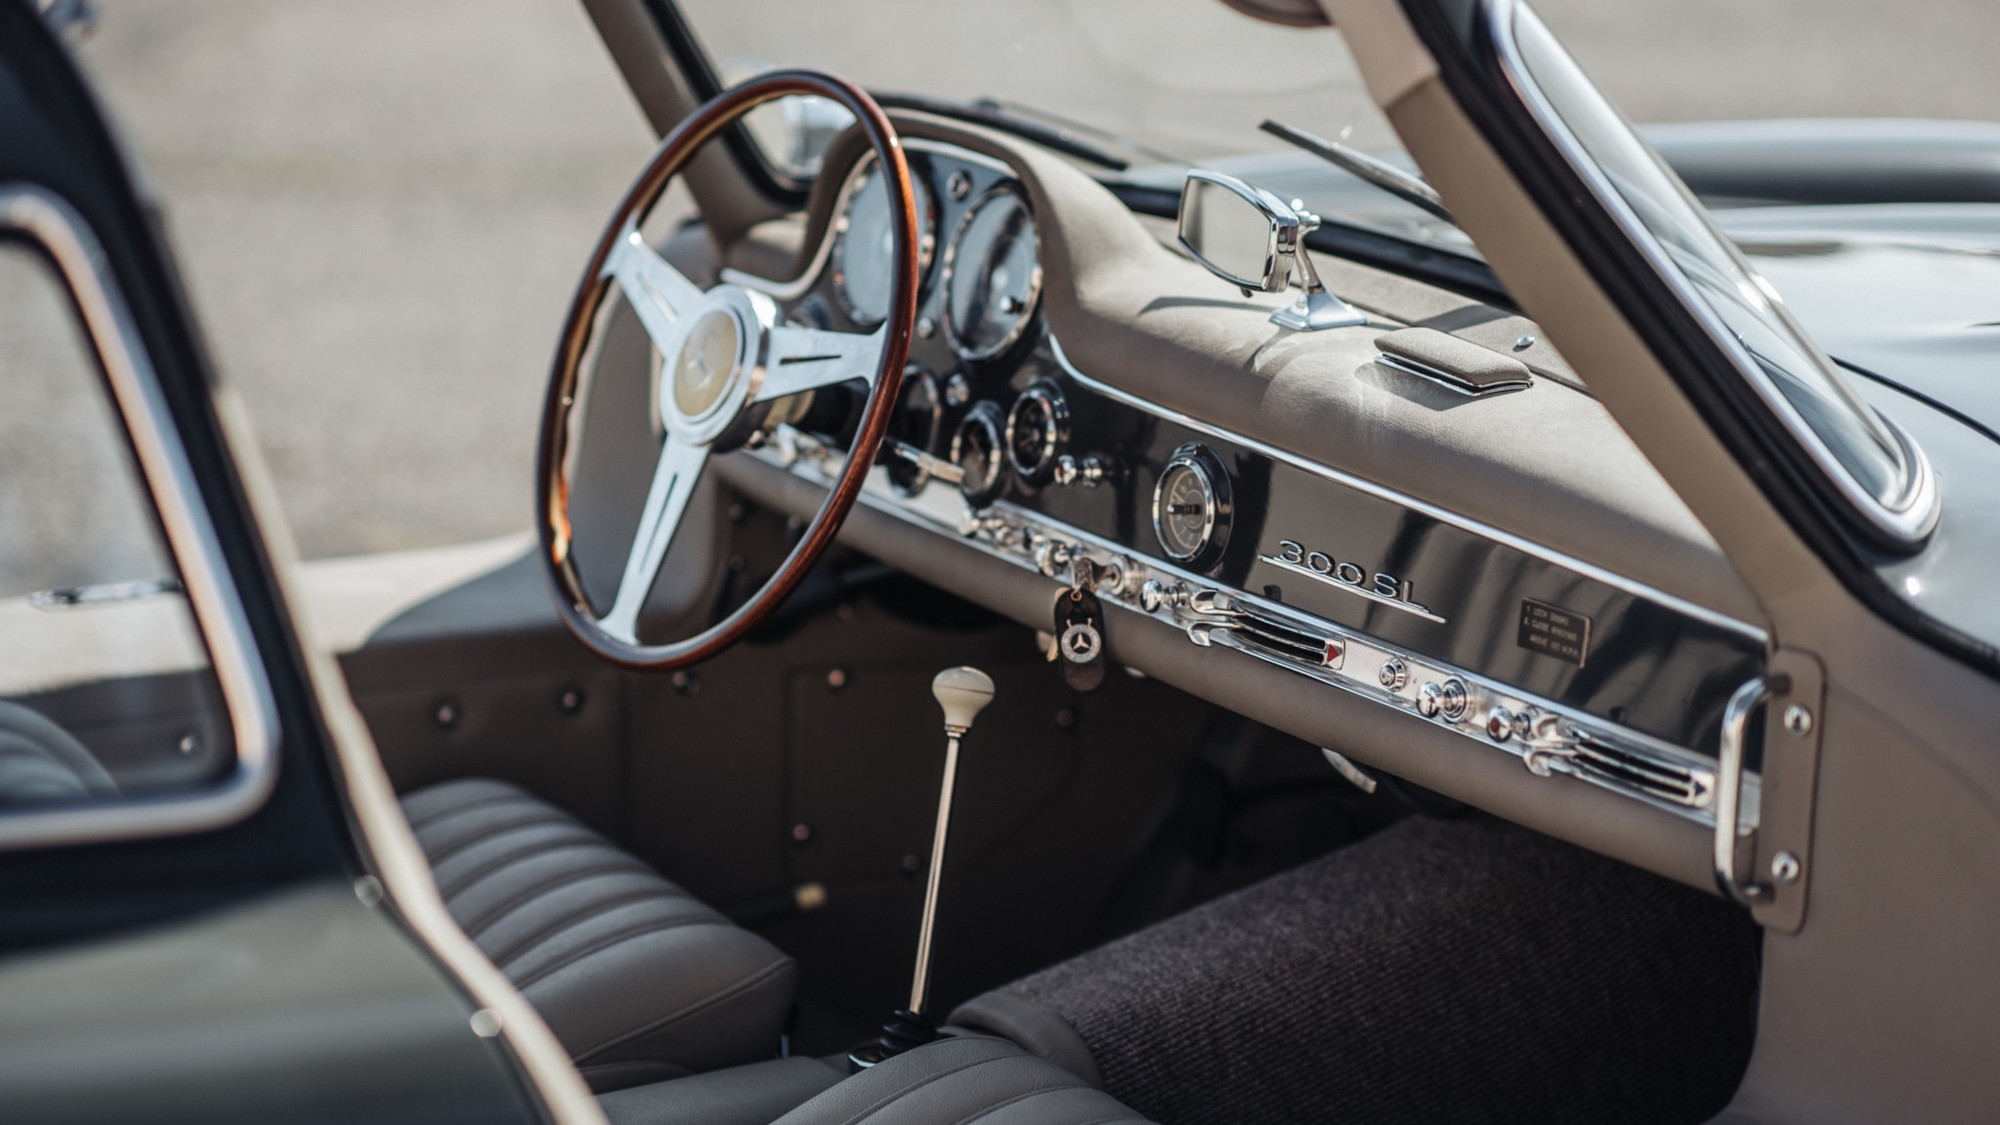 1956 Mercedes-Benz 300SL Gullwing, Bring a Trailer premium auction